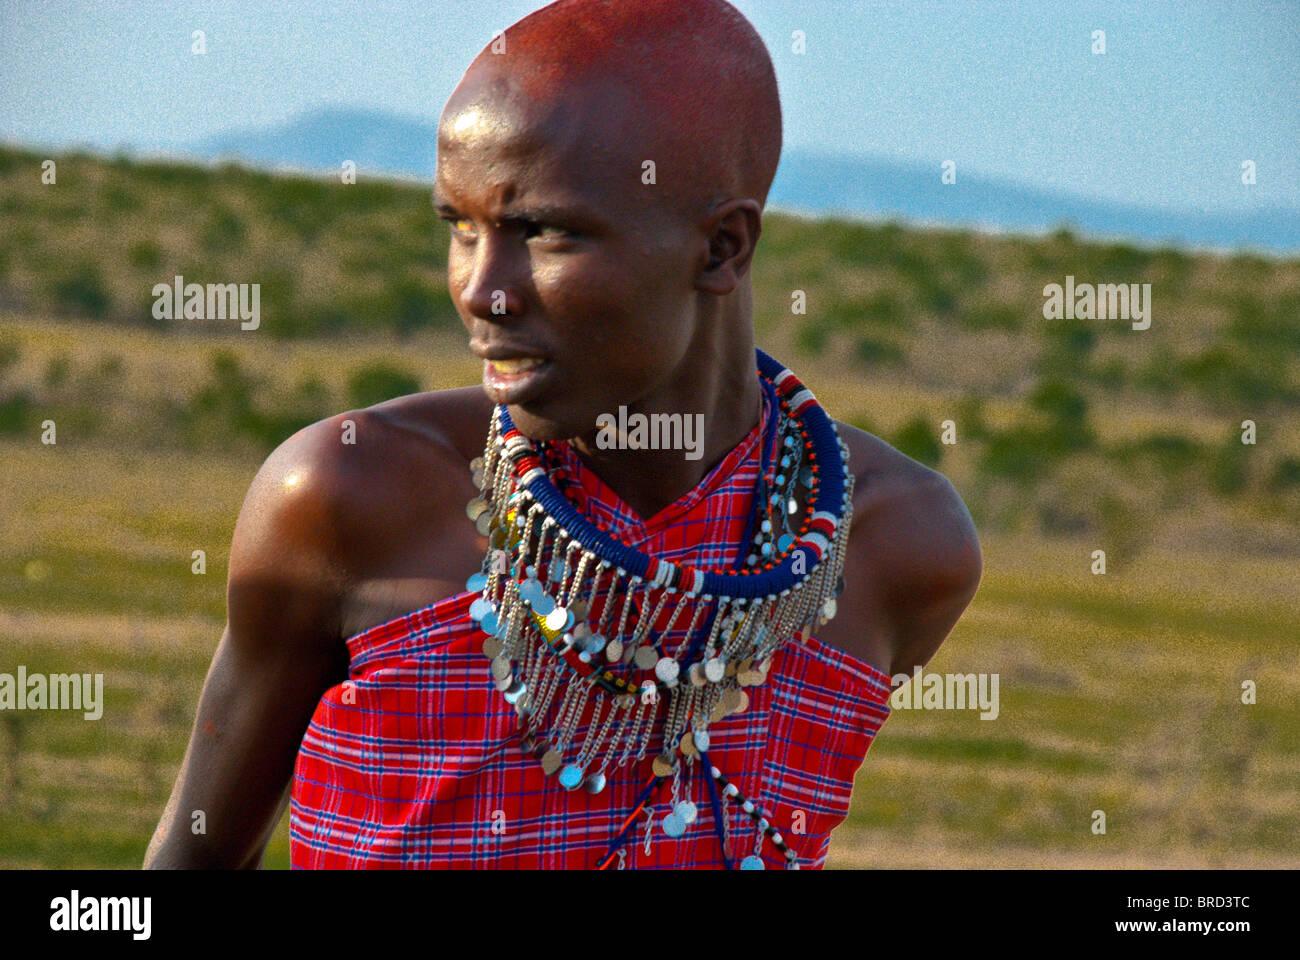 Masai woman wearing traditional dress, Masai Mara, Kenya, Africa Stock Photo